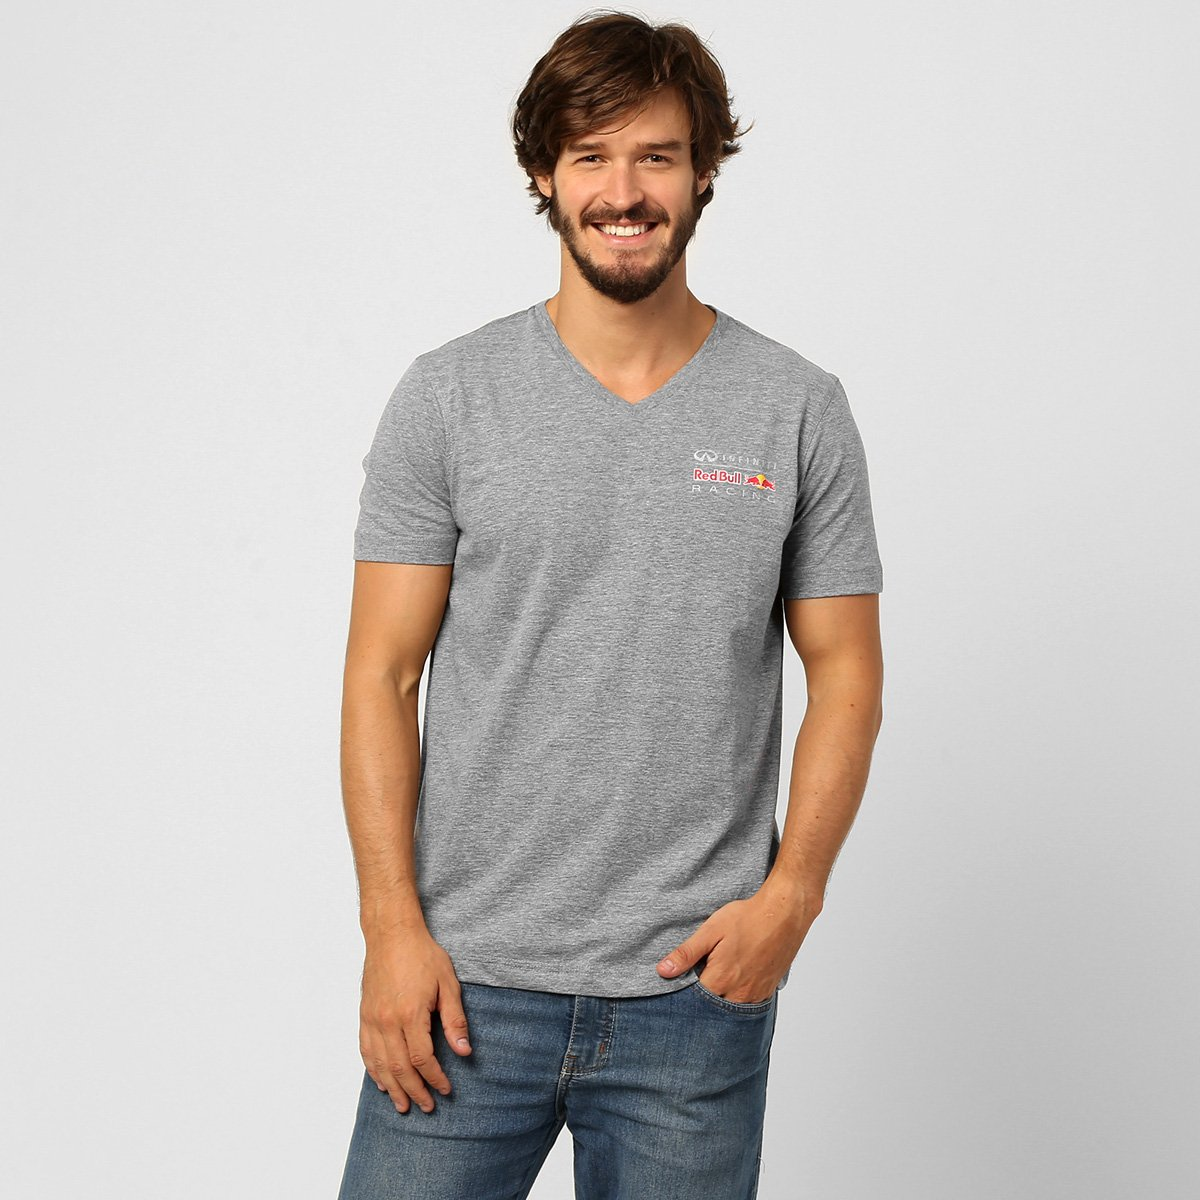 b24fa47806c31 Camiseta Red Bull - Compre Agora